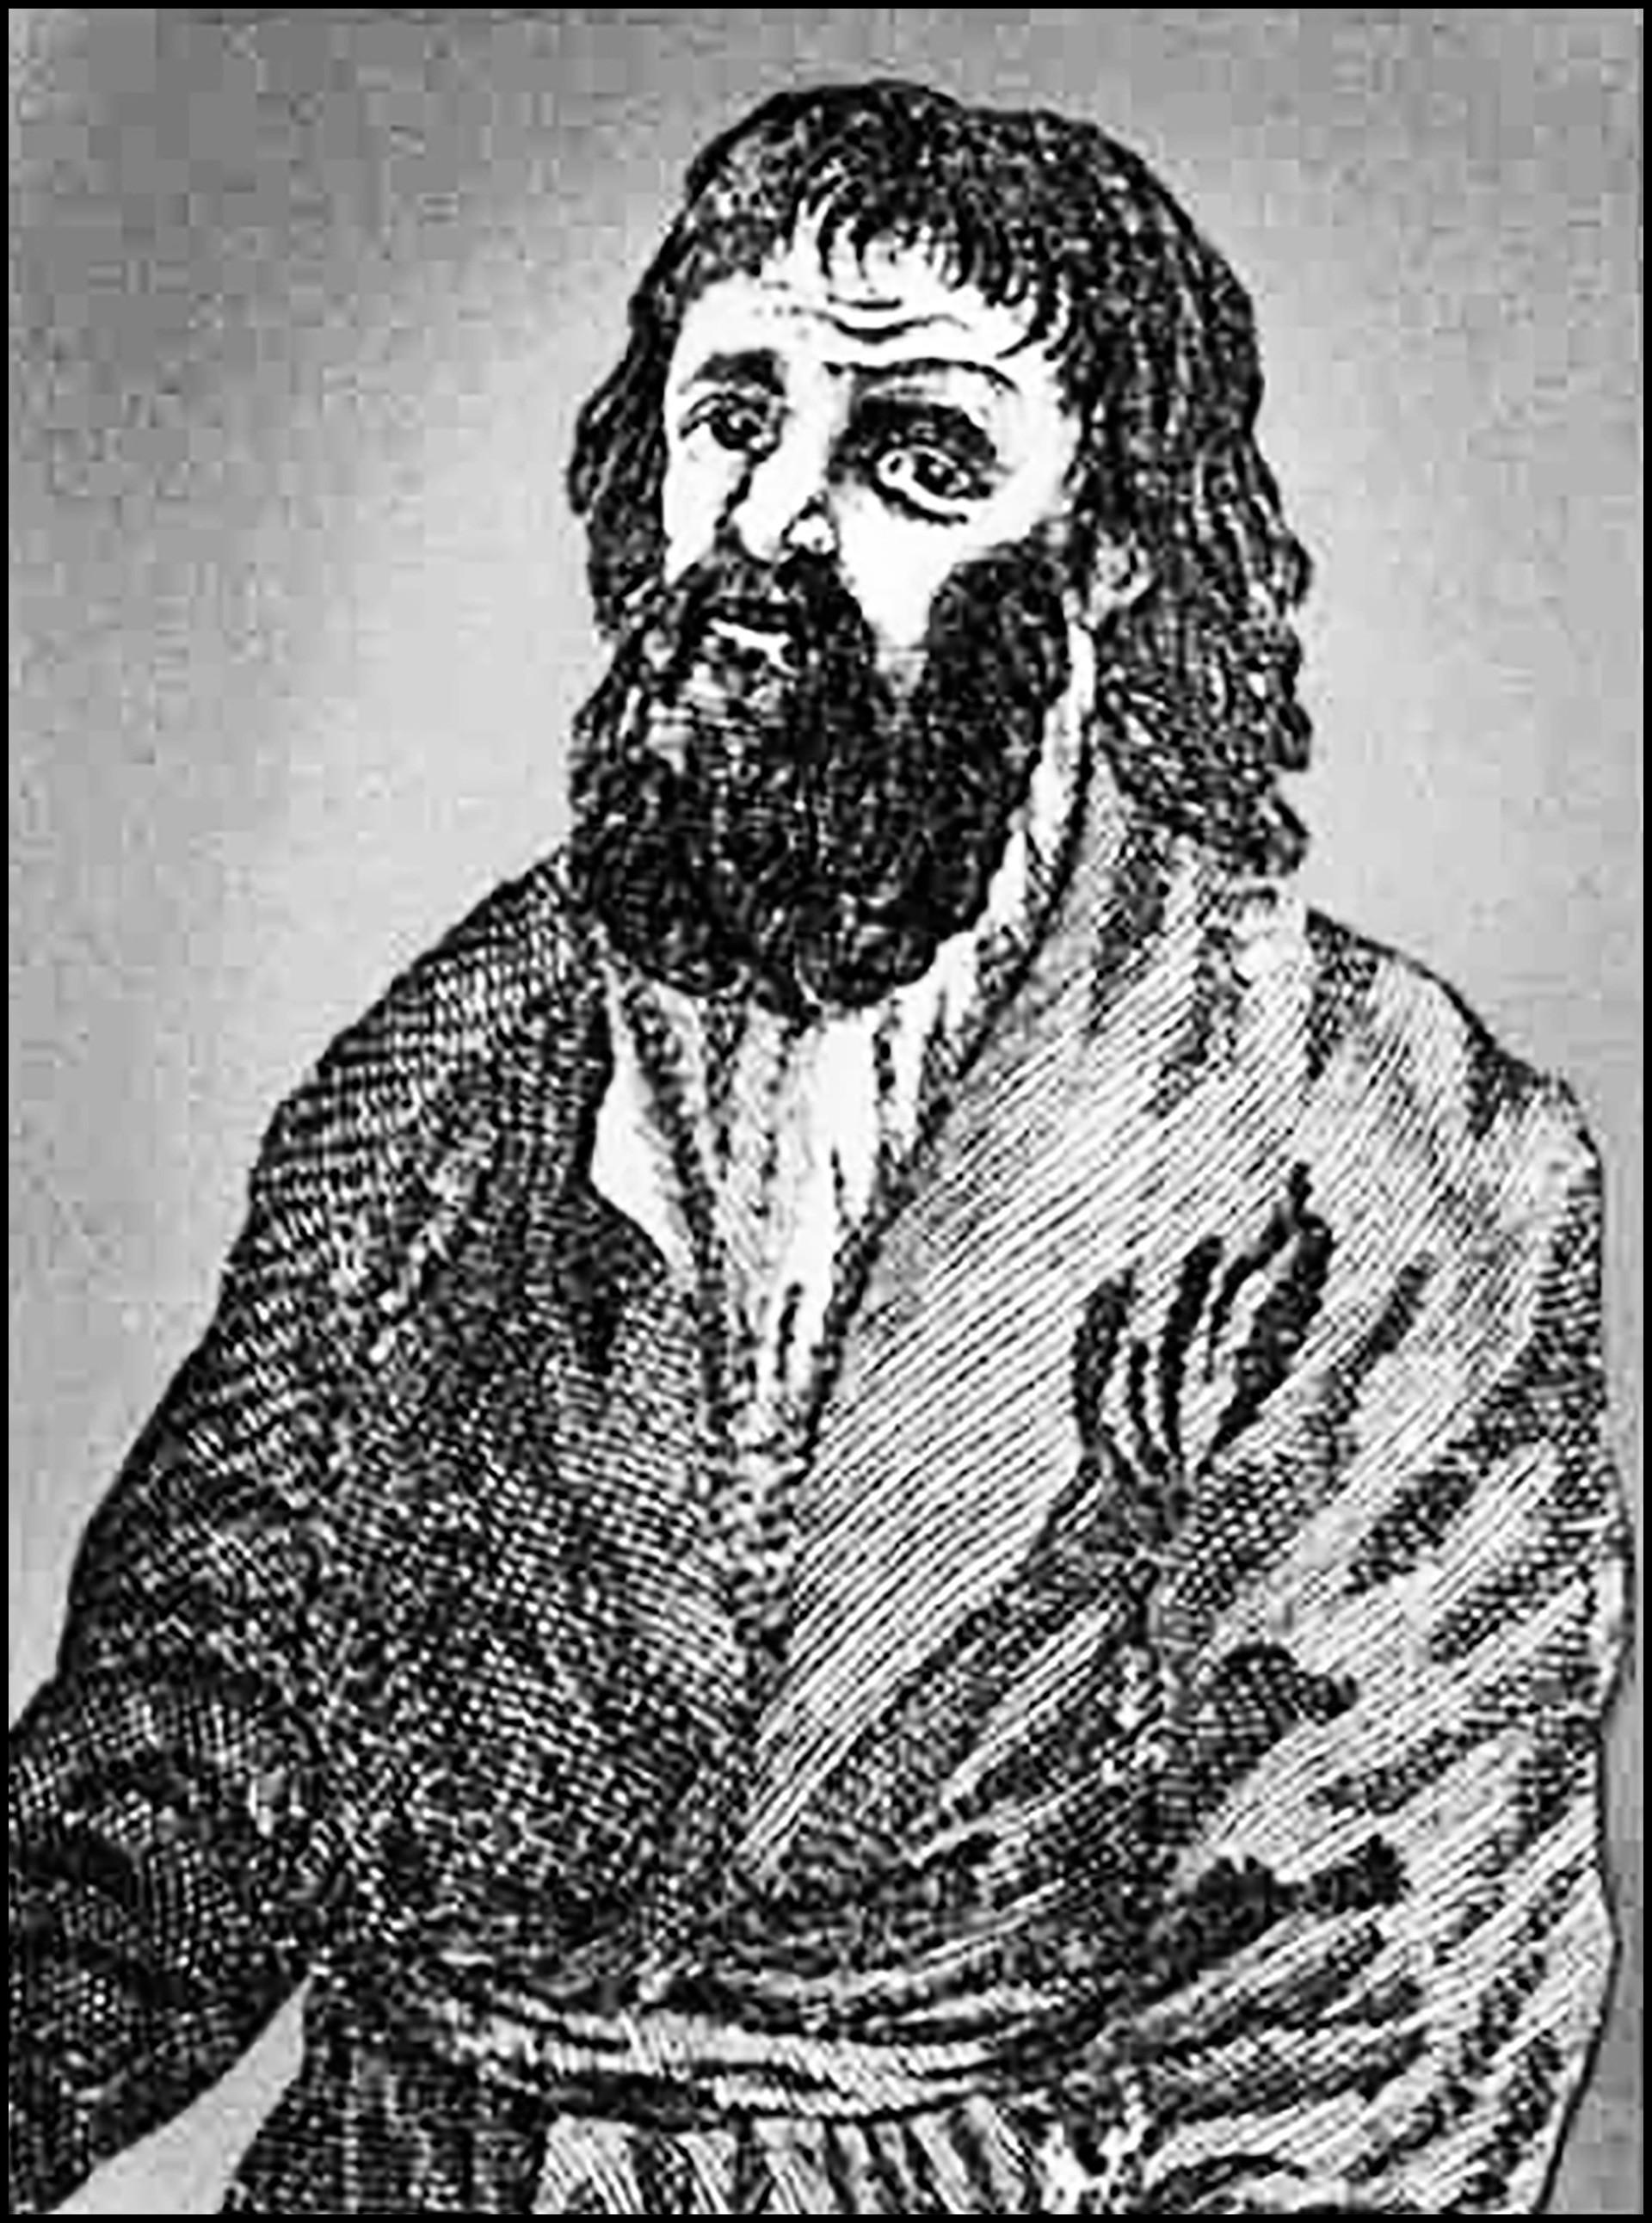 A portrait of Vanka Cain.